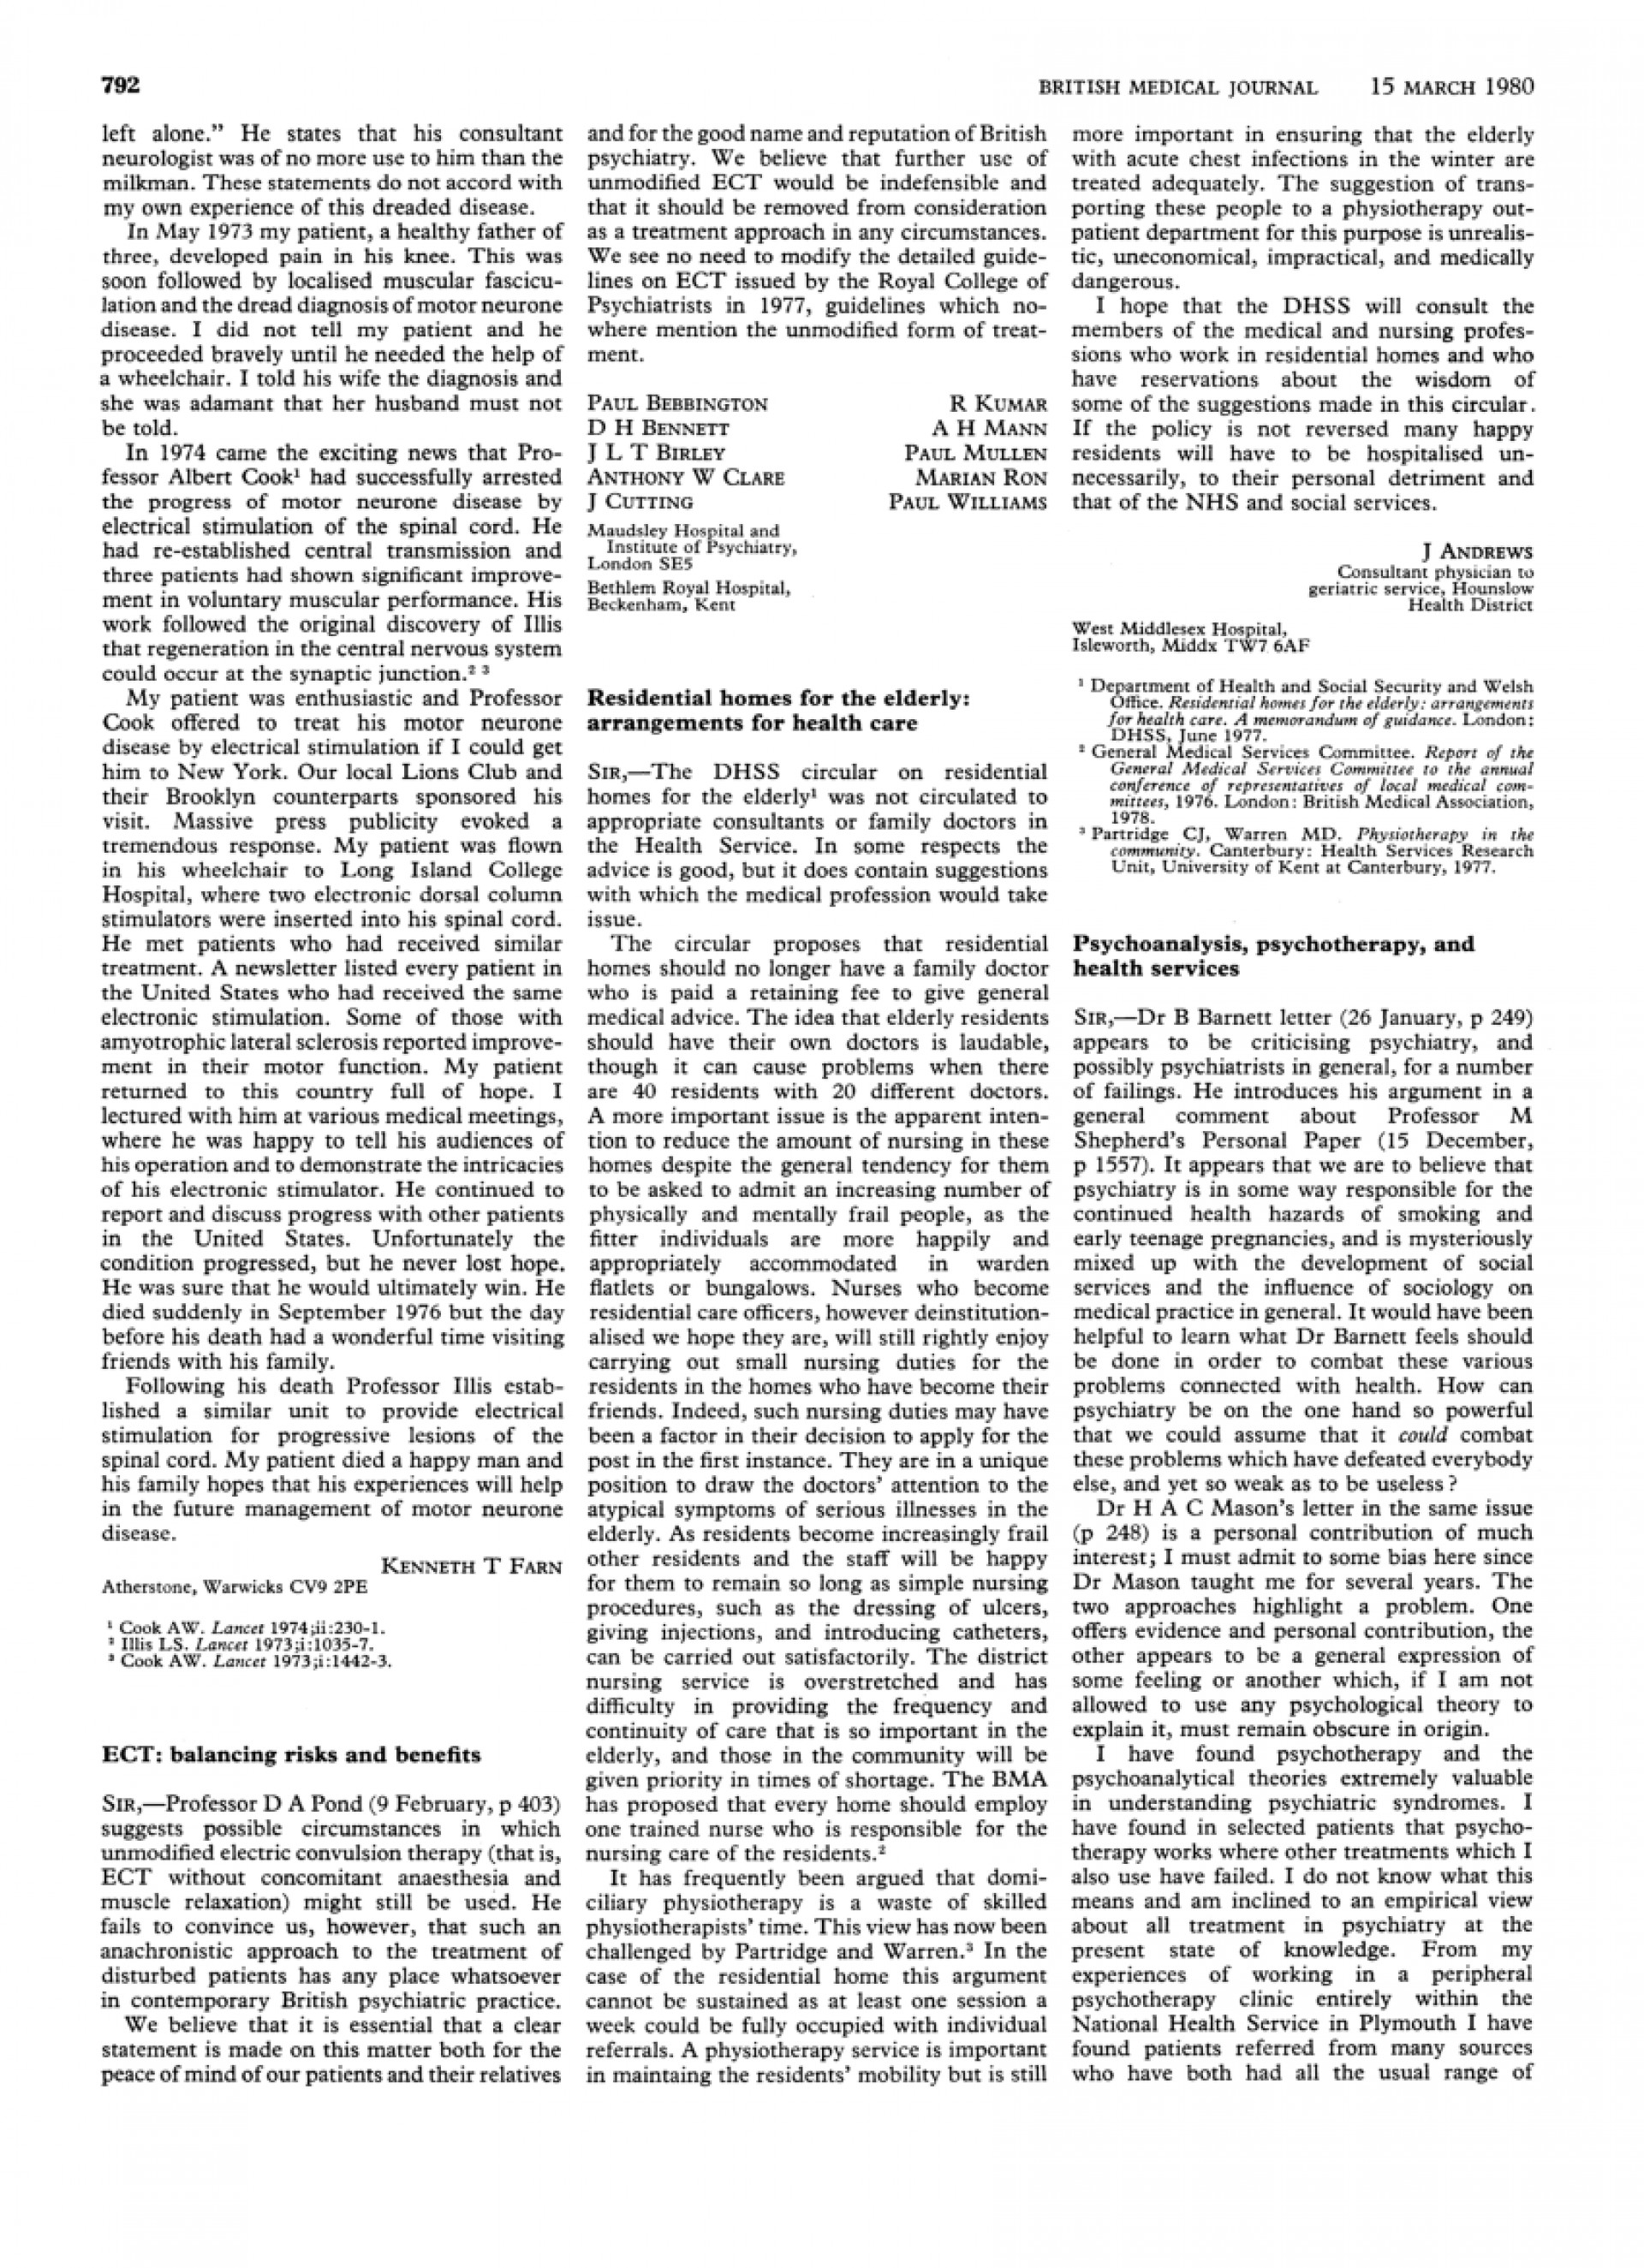 014 Medical Marijuana Essay Largepreview Wonderful Intro Paperwork Vermont Argumentative Topics 1920